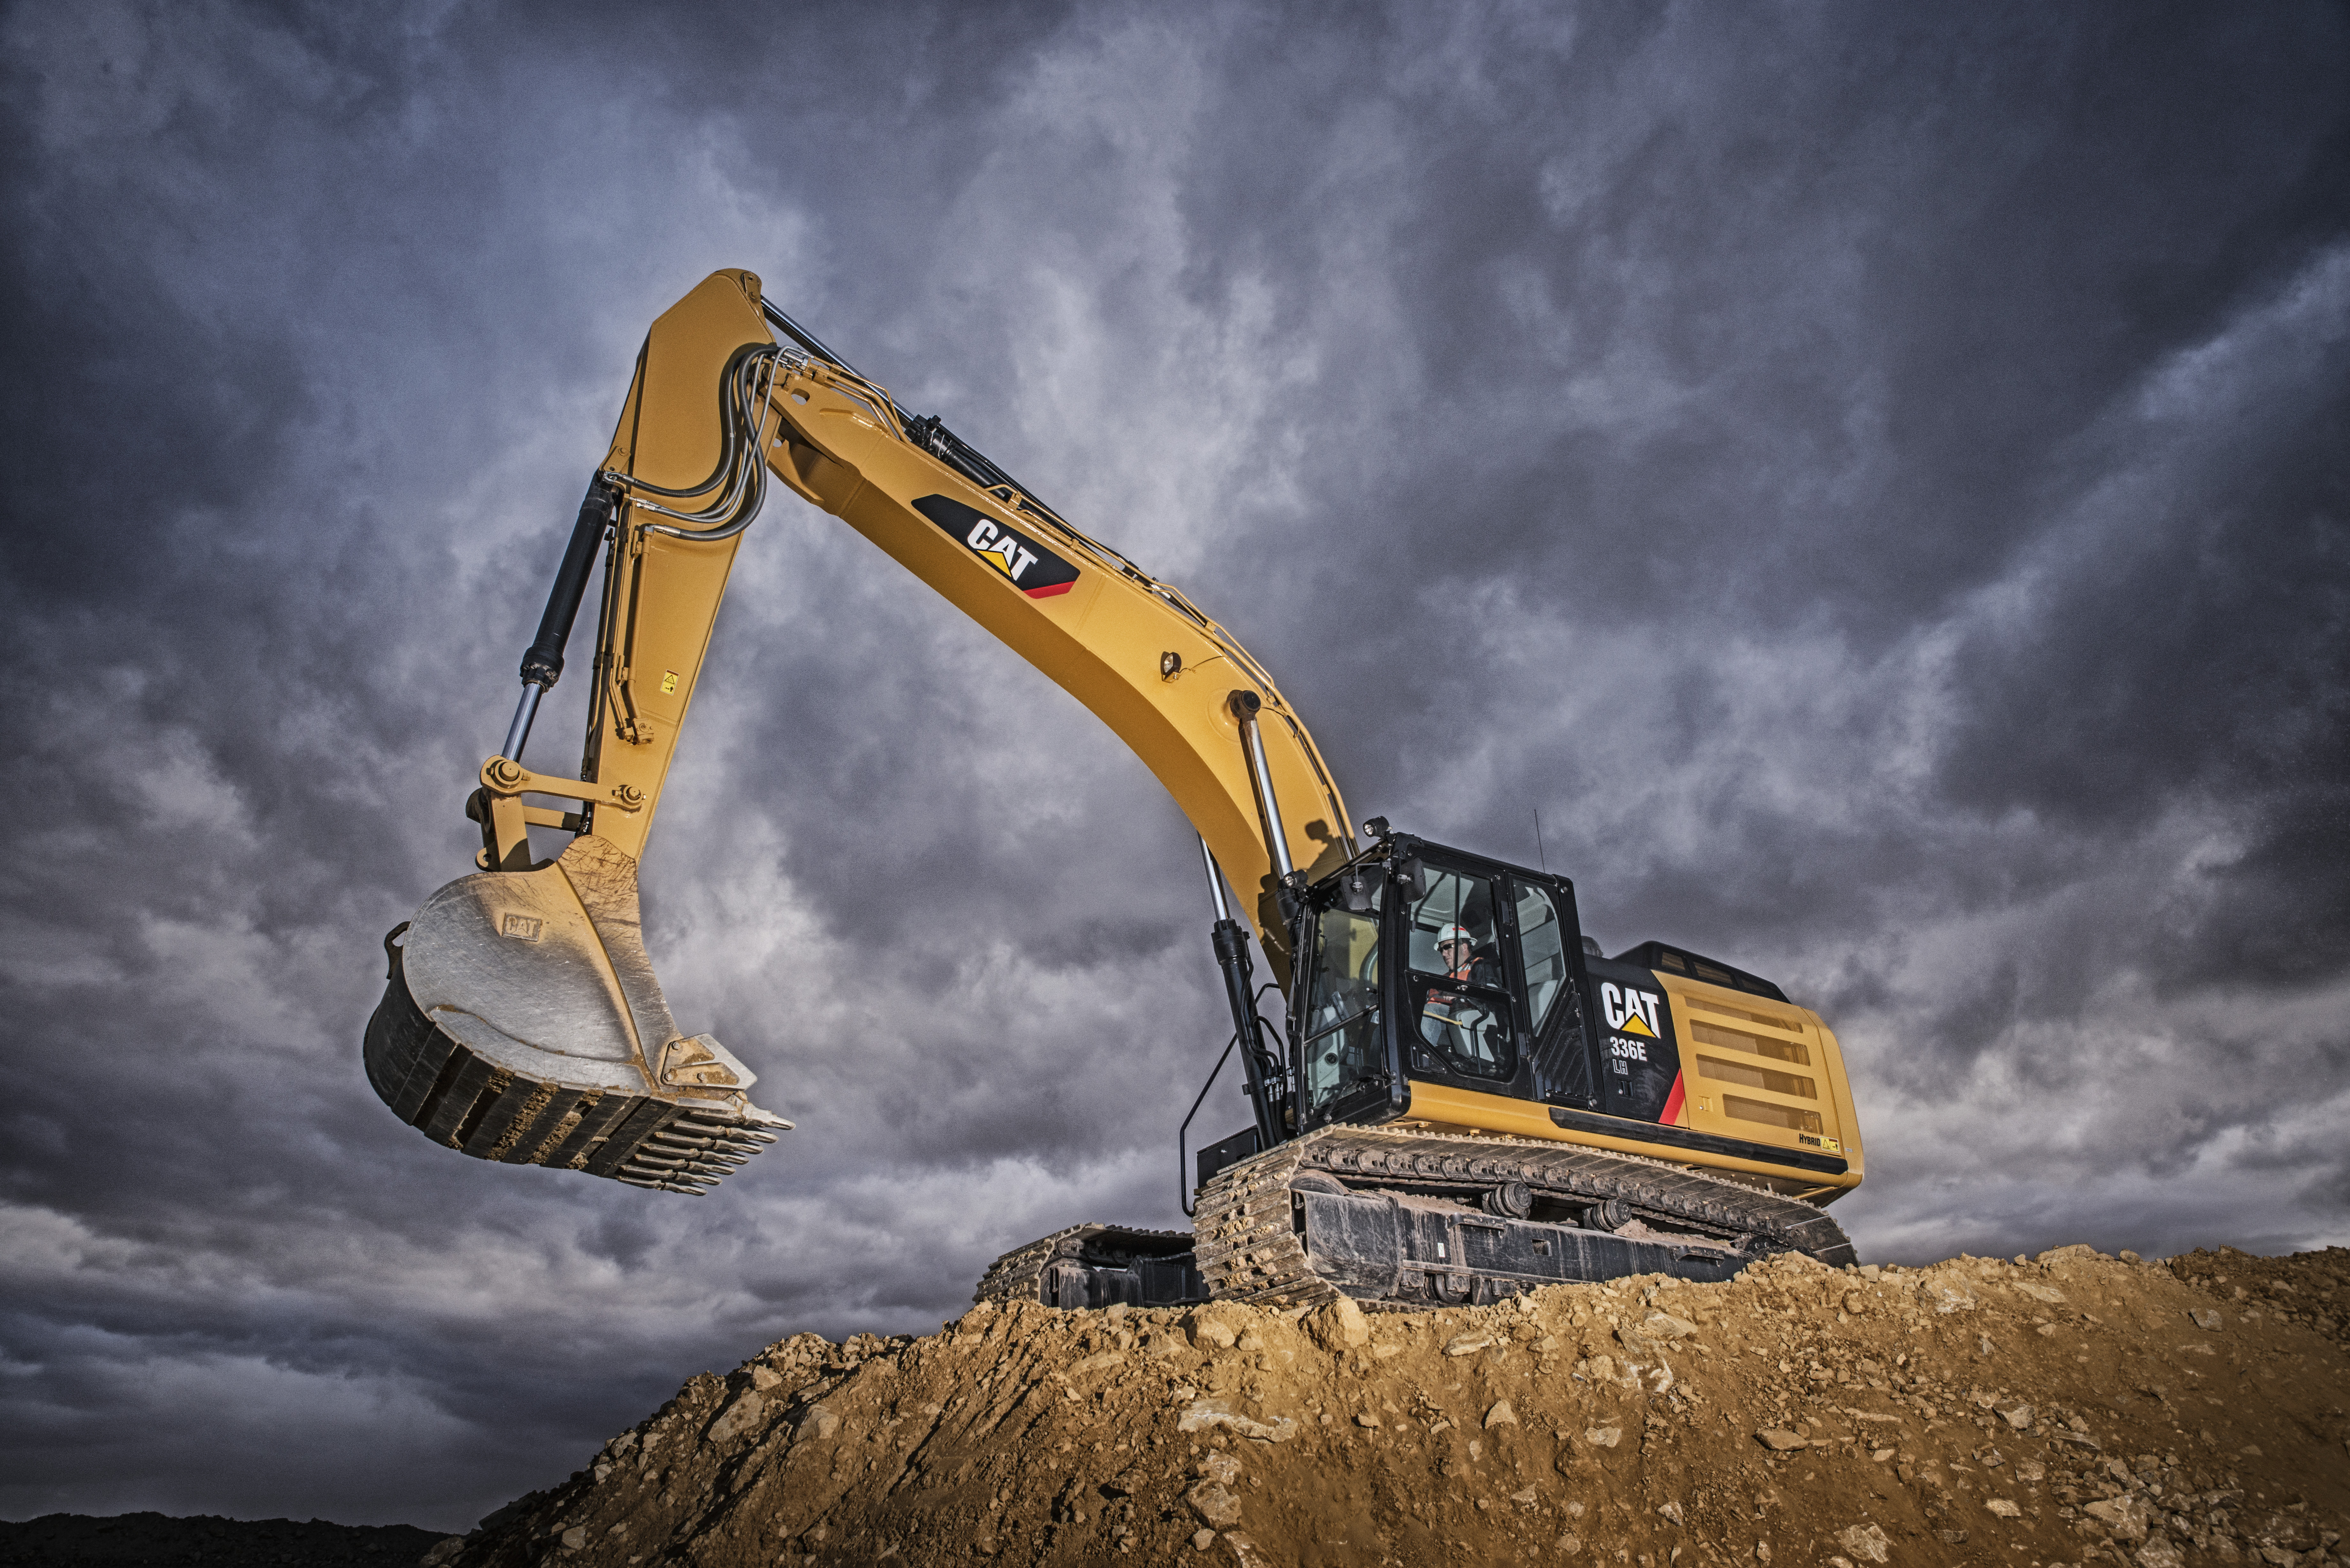 Caterpillar Excavator Wallpapers Vehicles HQ Caterpillar